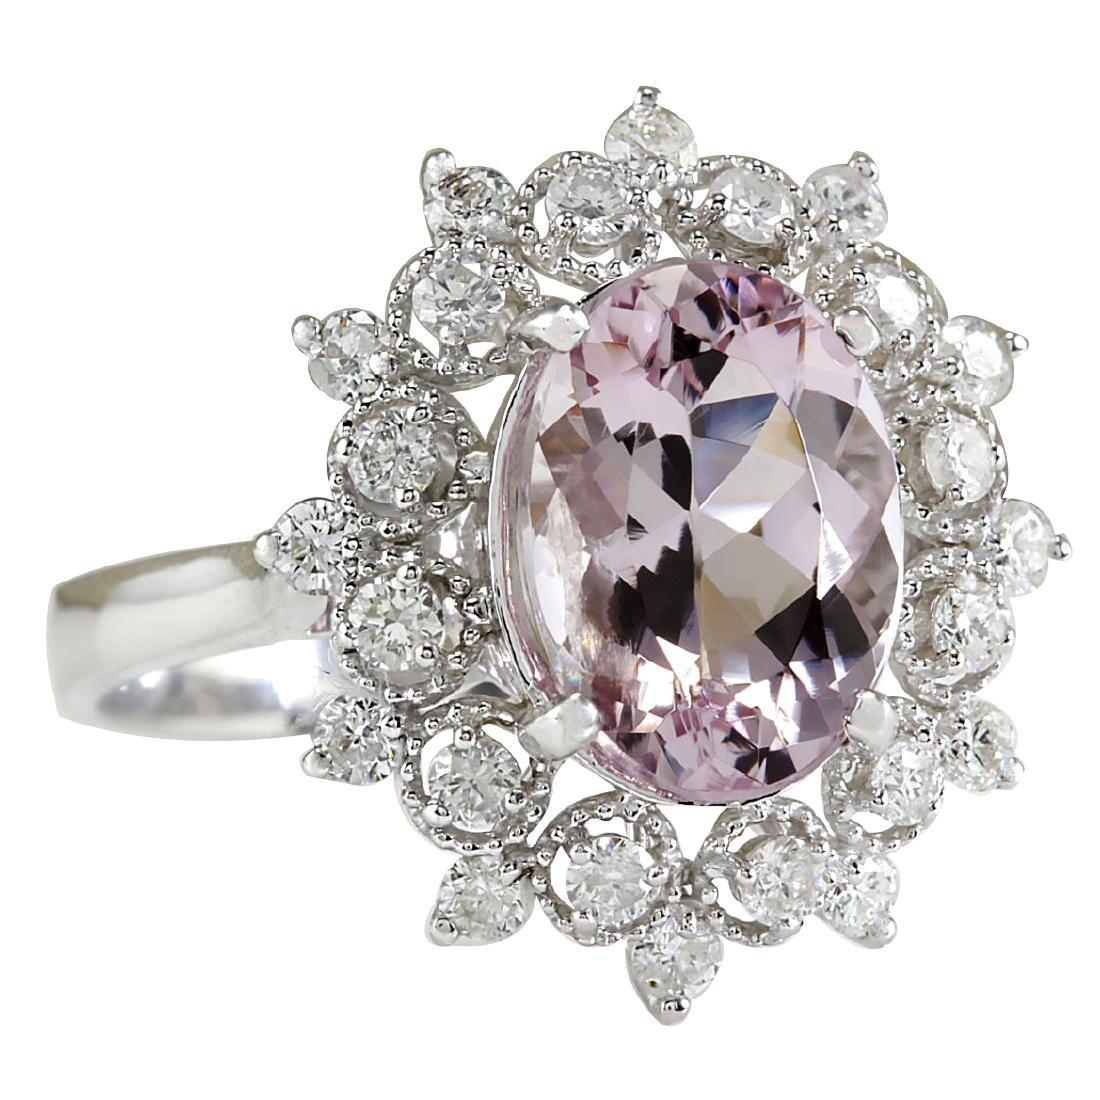 3.68CTW Natural Morganite And Diamond Ring In 18K White - 2